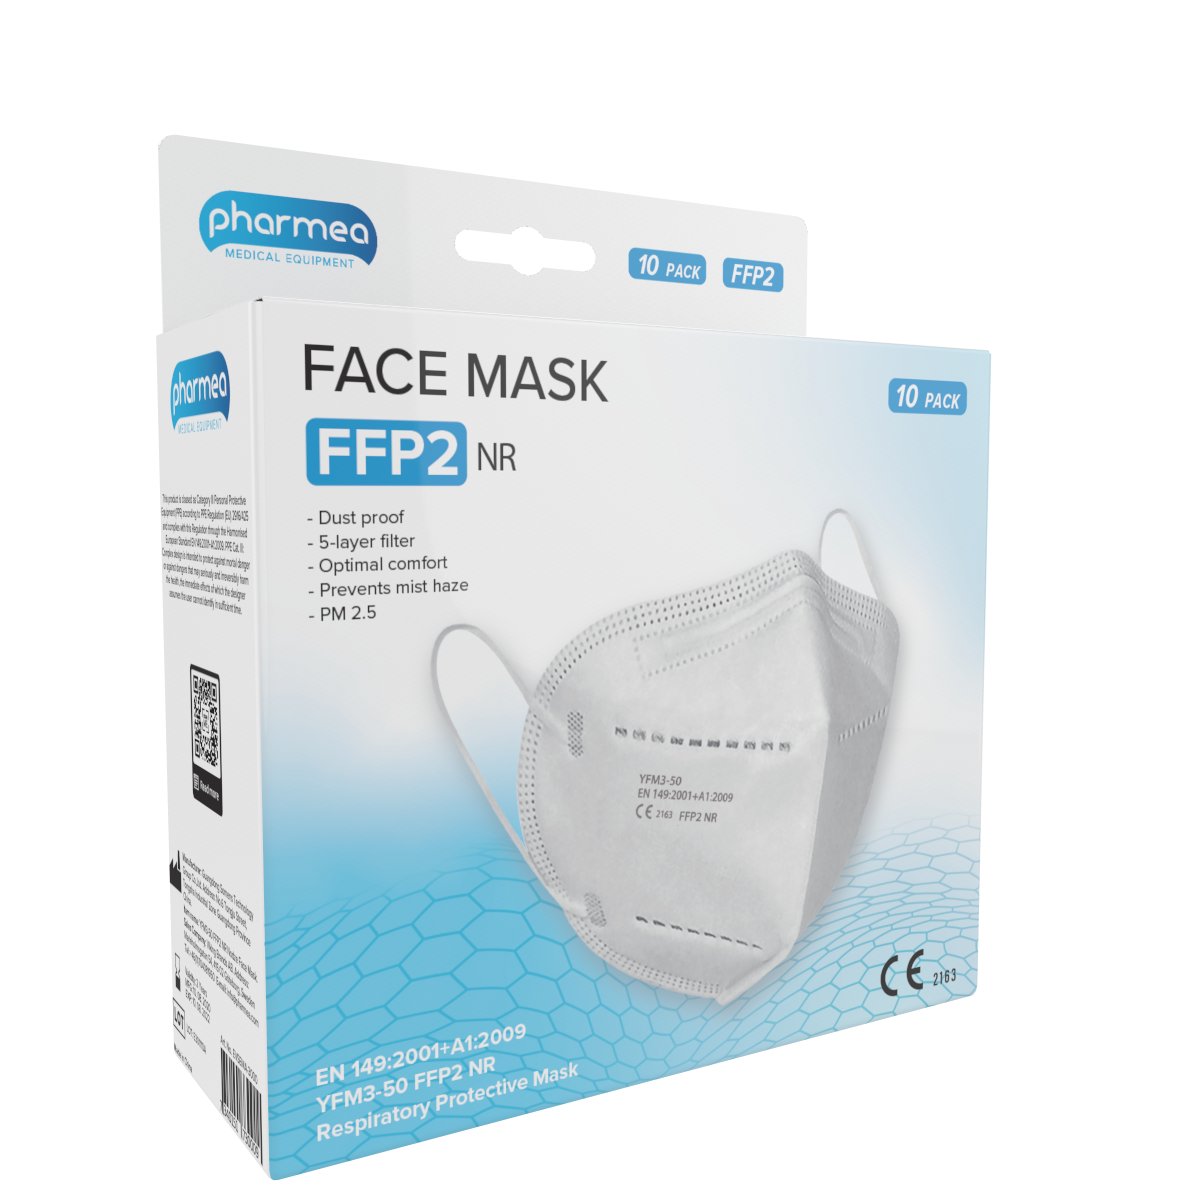 Pharmea Facemask FFP2 Mondmaskers 10 stuks